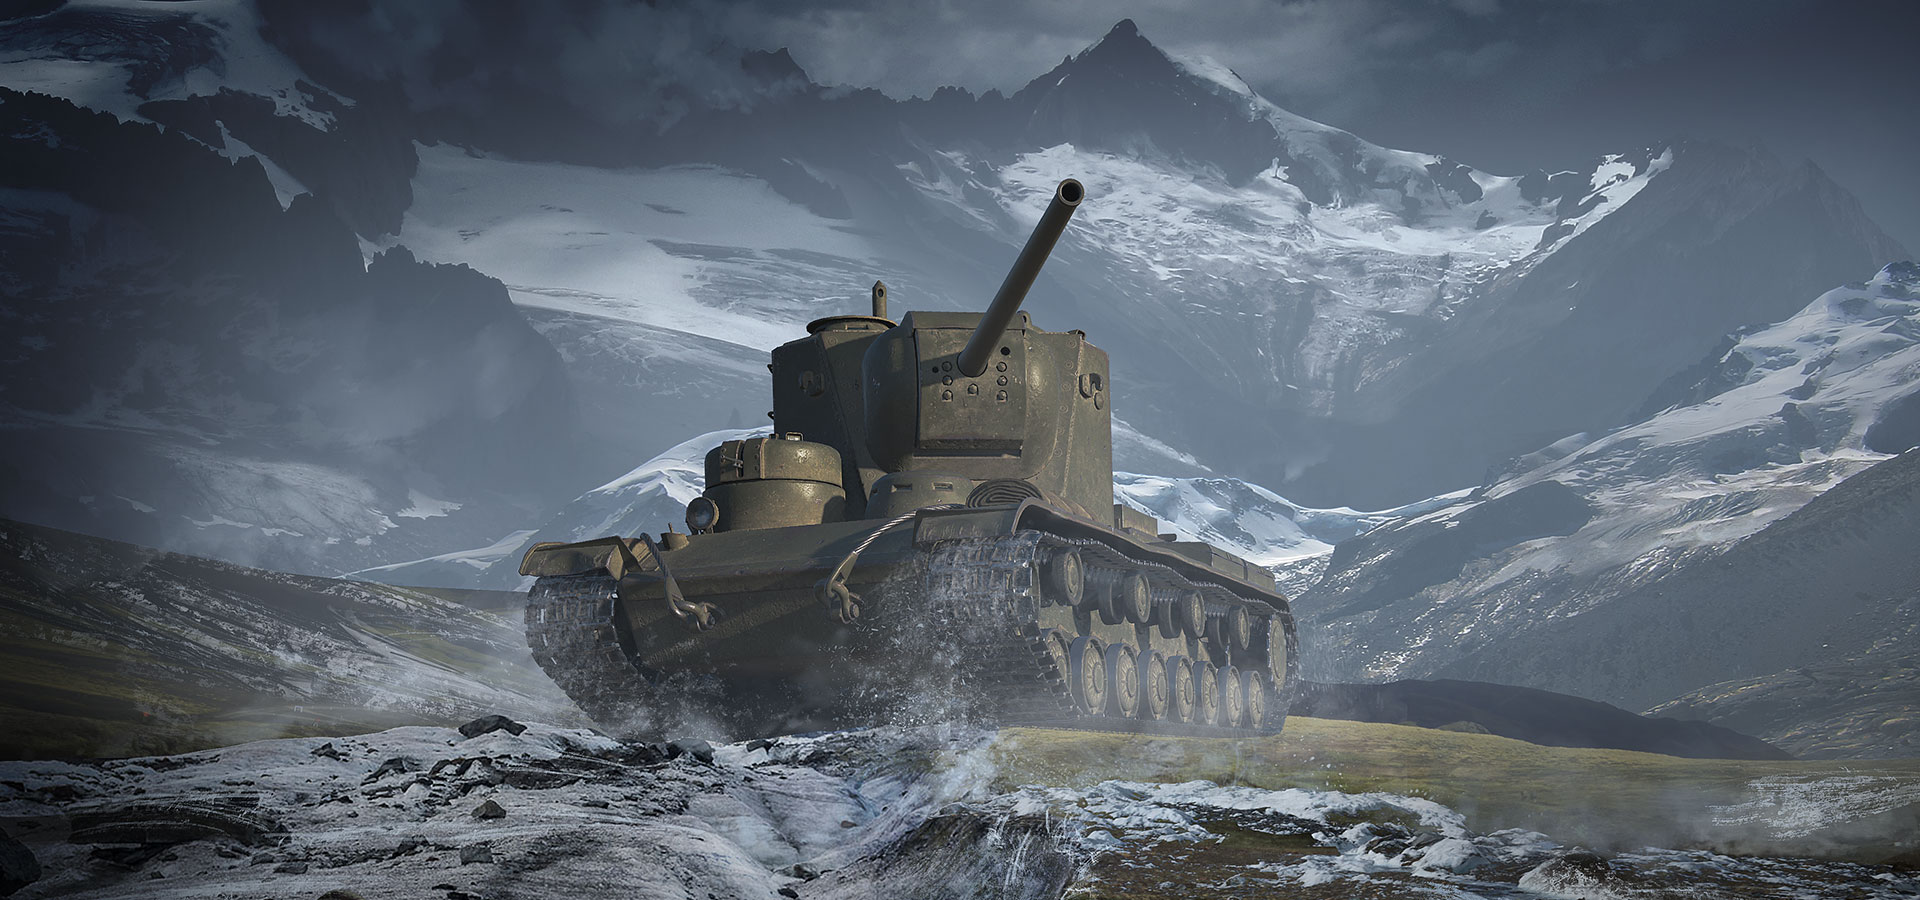 World of tanks premium account matchmaking